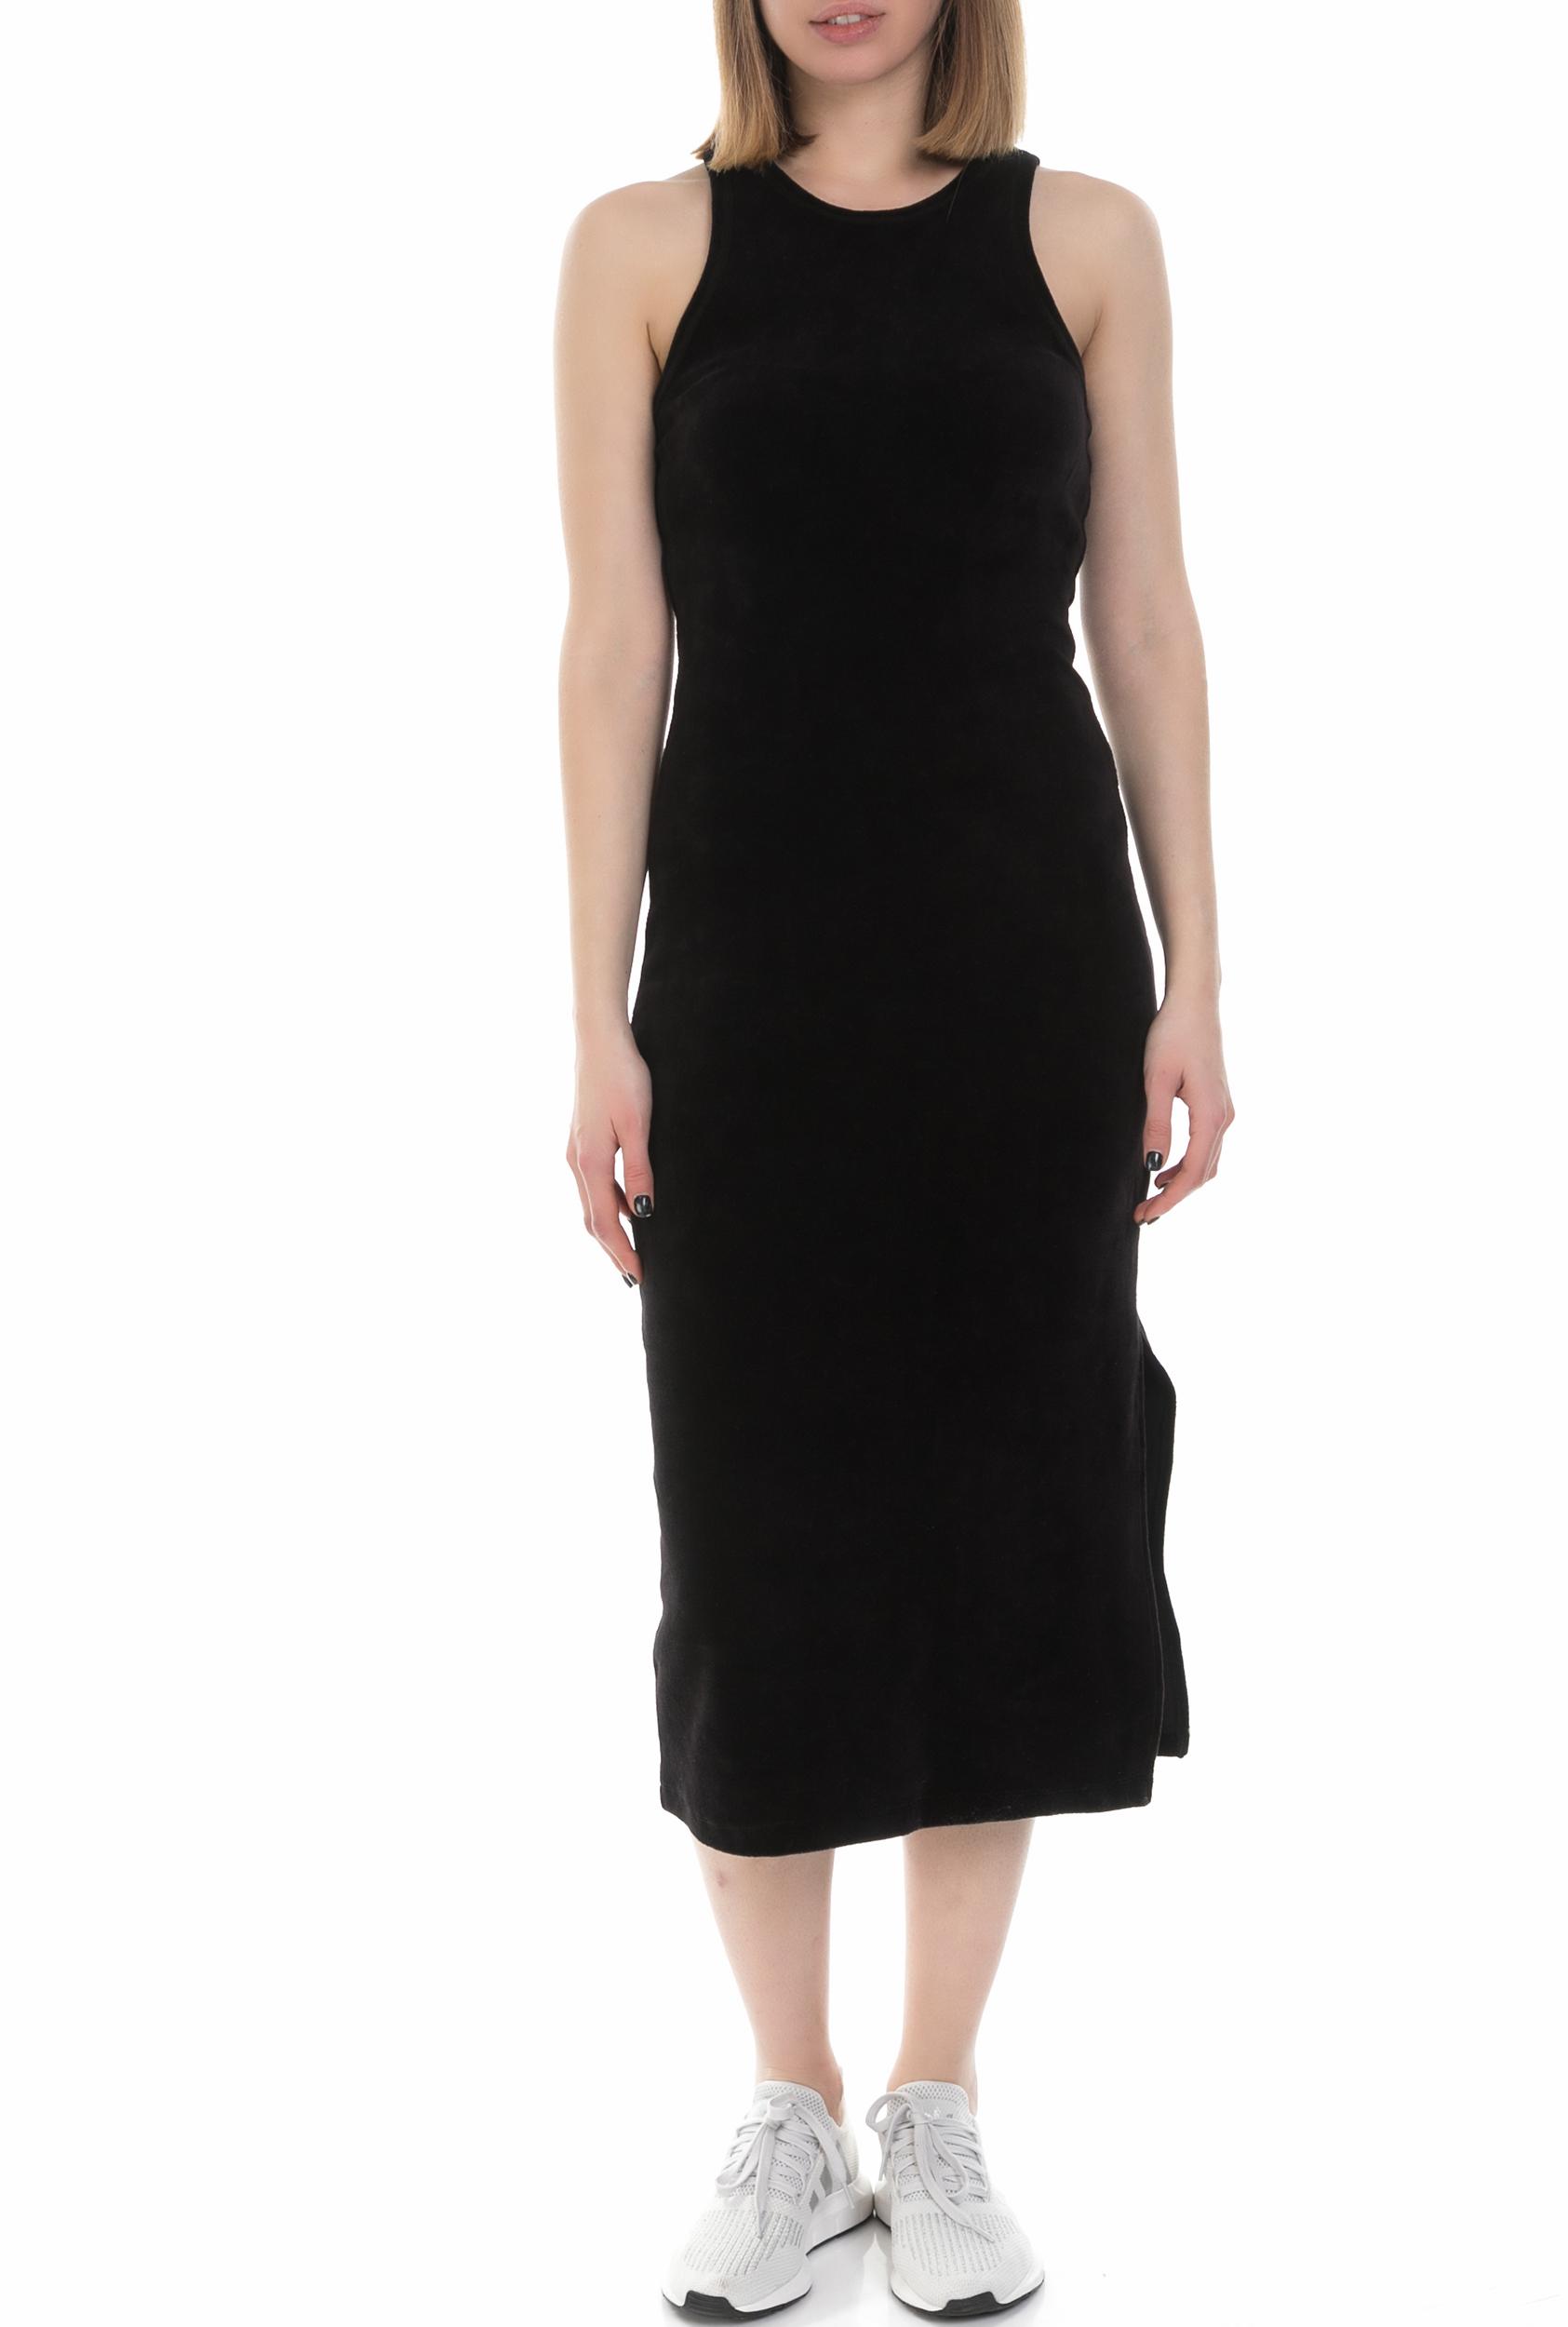 bb214df5a7f8 JUICY COUTURE - Γυναικείο αμάνικο midi φόρεμα Juicy Couture μαύρο